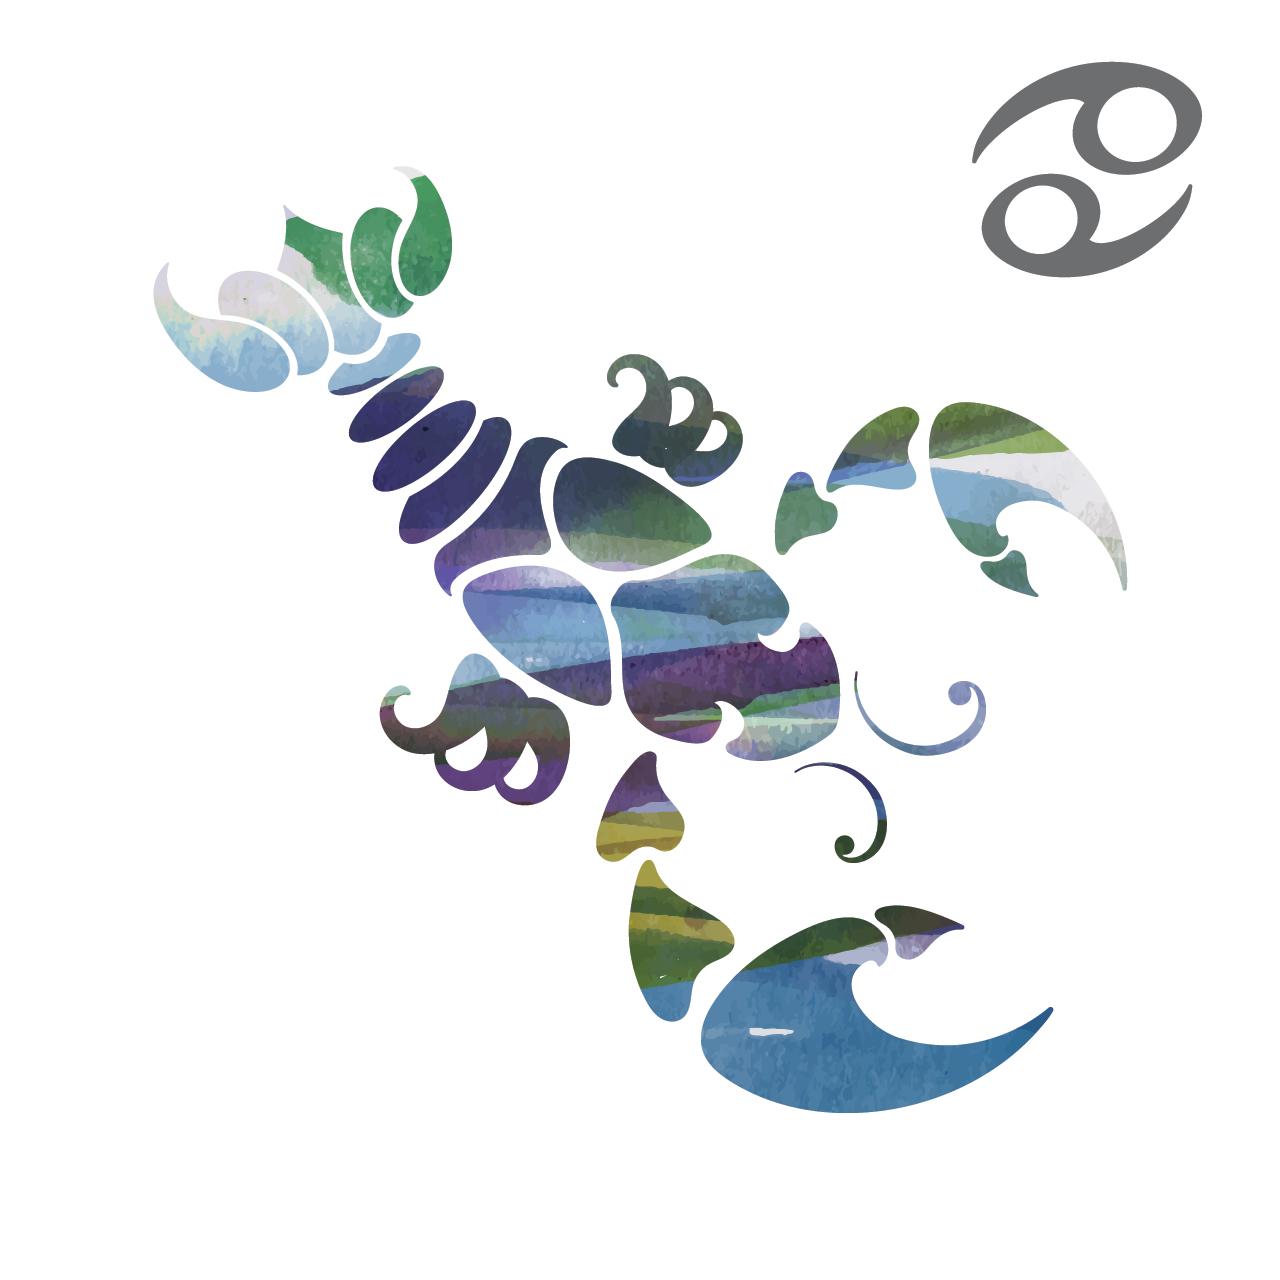 Horoscop lunar Minerva decembrie 2020 - Rac